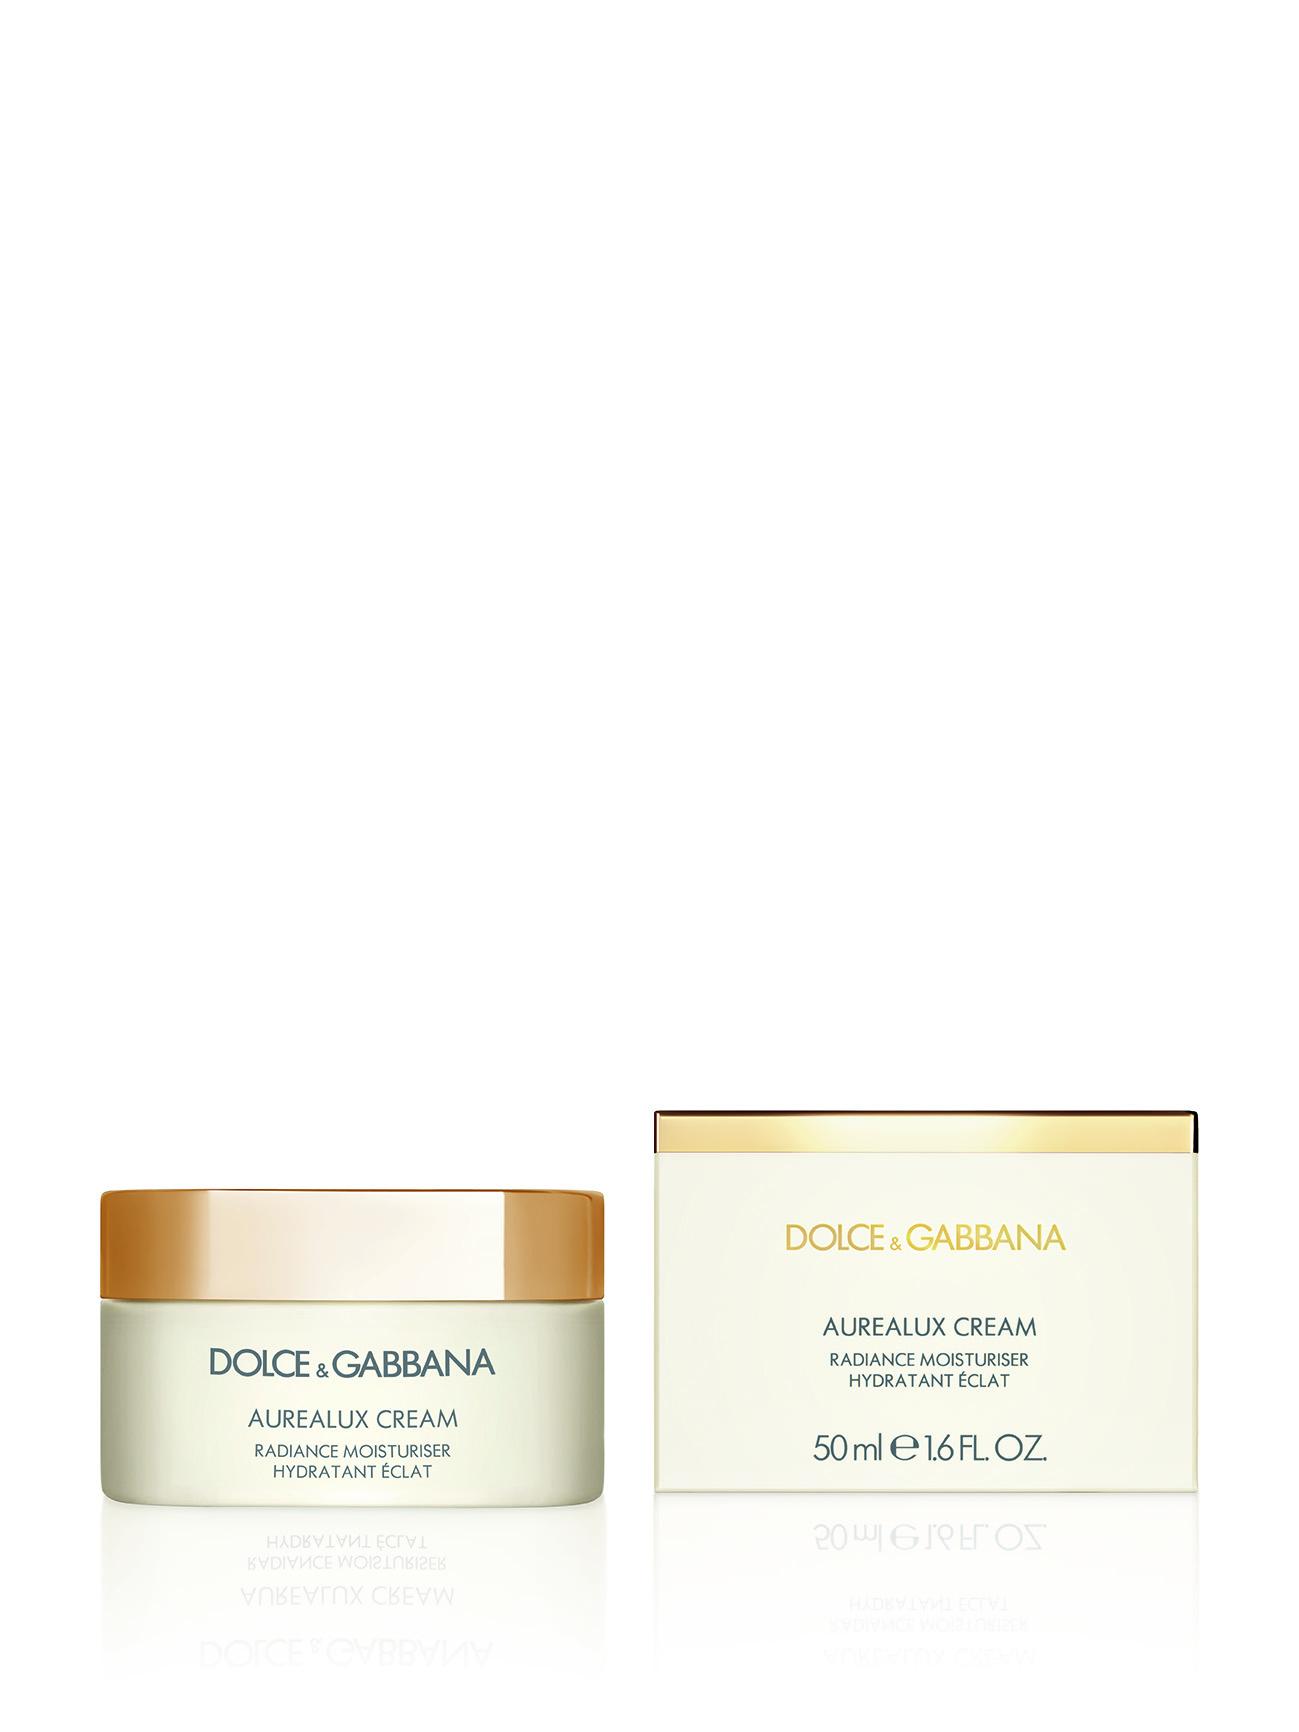 Dolce & Gabbana Skincare Aurealux Cream (50 ml, PVPR 98,50 €)